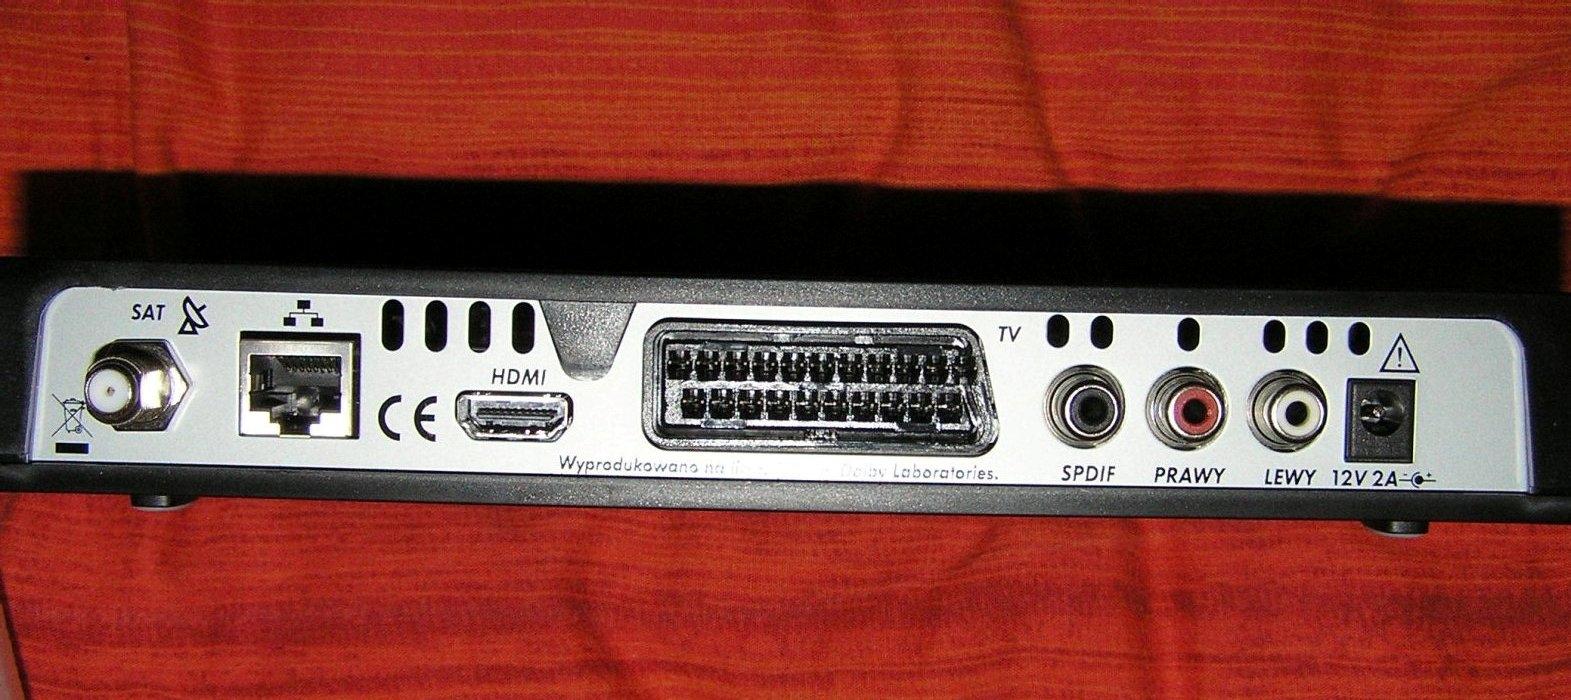 Pod��czenie dekodera Cyfry+ Sagemcom HDTV do karty TV hybrid LV3H